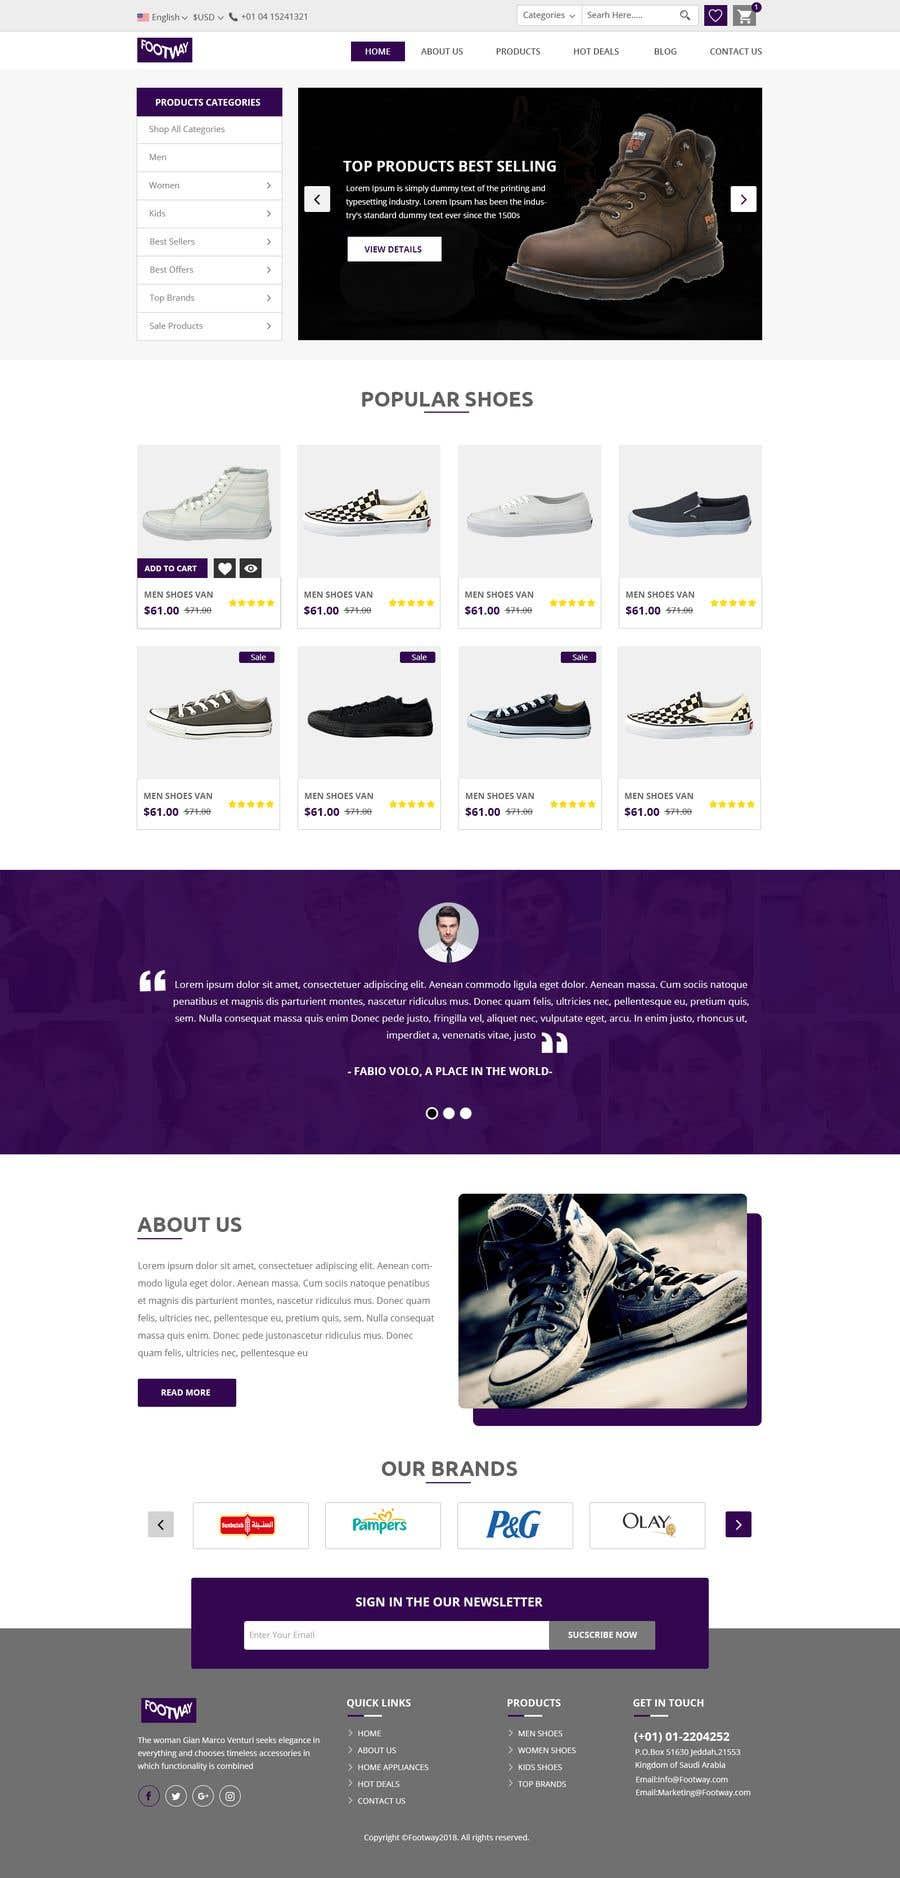 Entry #3 by Baljeetsingh8551 for Web UI design of User